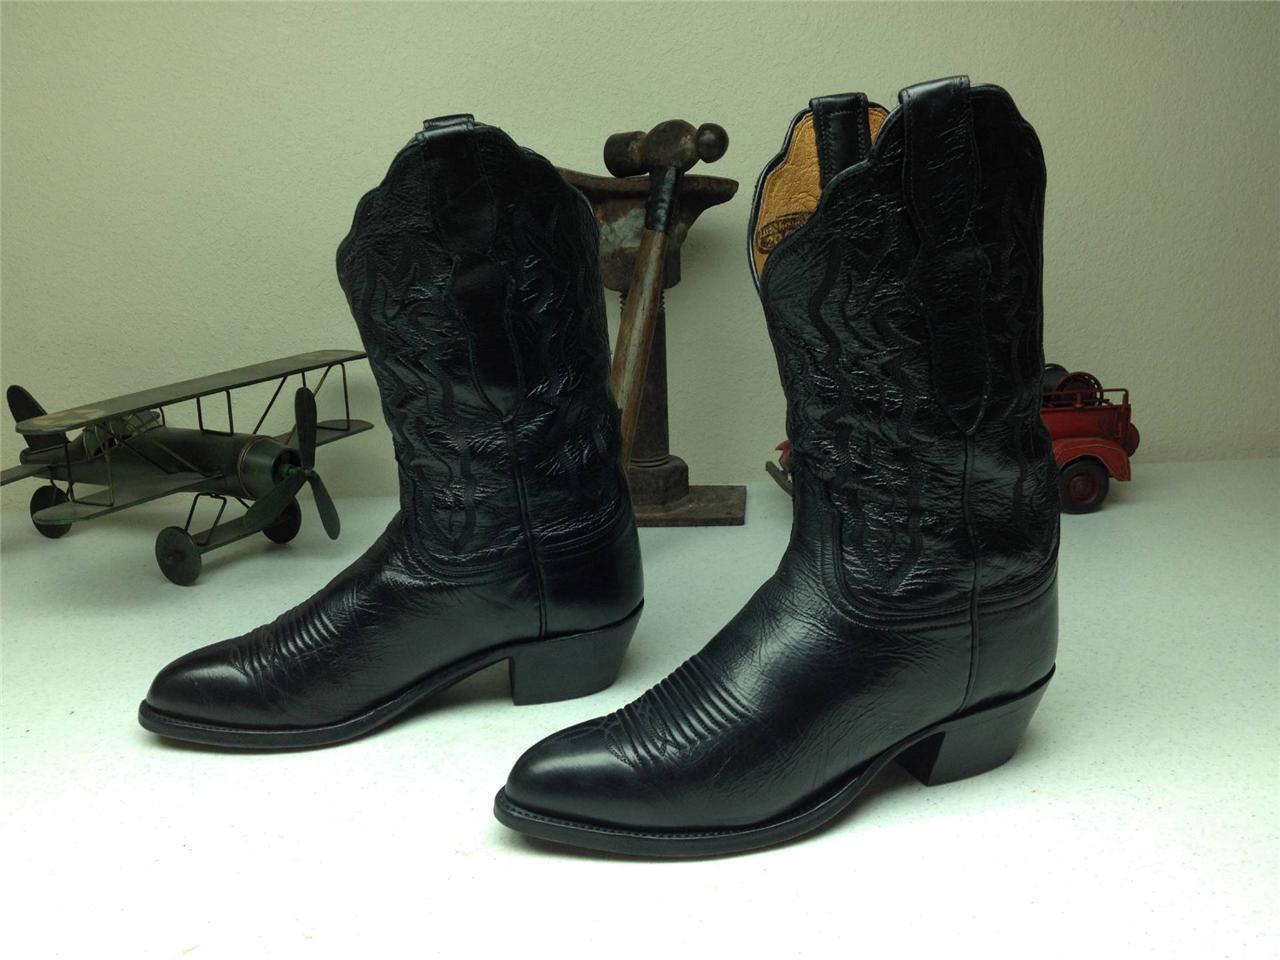 LUCCHESE schwarz LEATHER MADE IN USA COUNTRY WESTERN DANCE Stiefel Größe 7 C